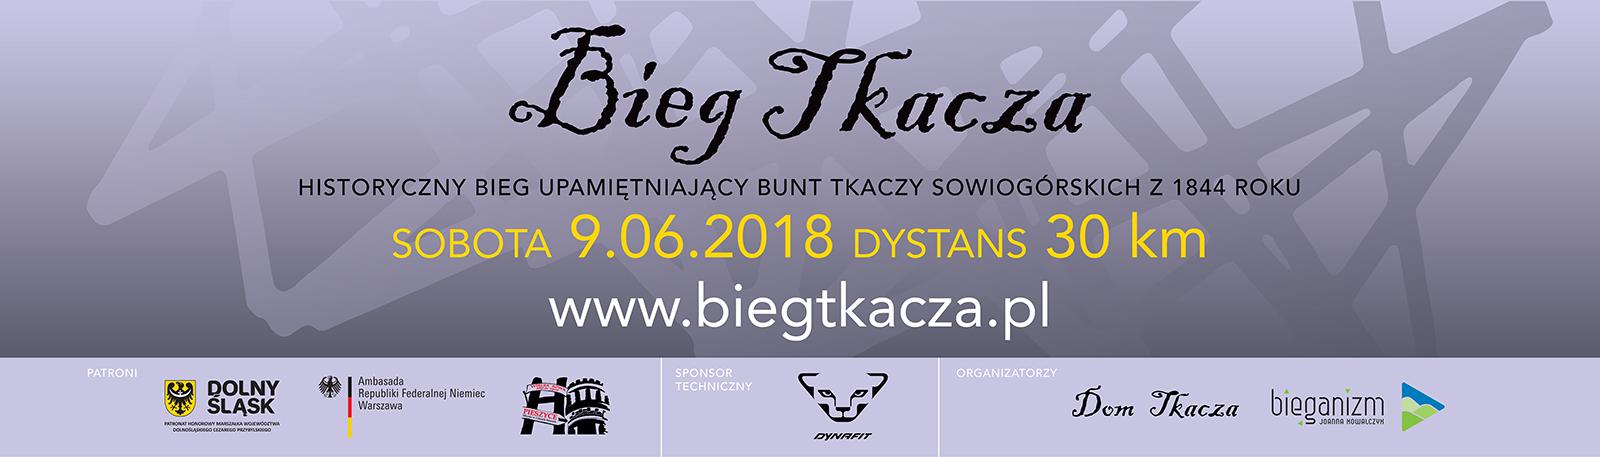 Bieg Tkacza banner 350 x 100 podglad